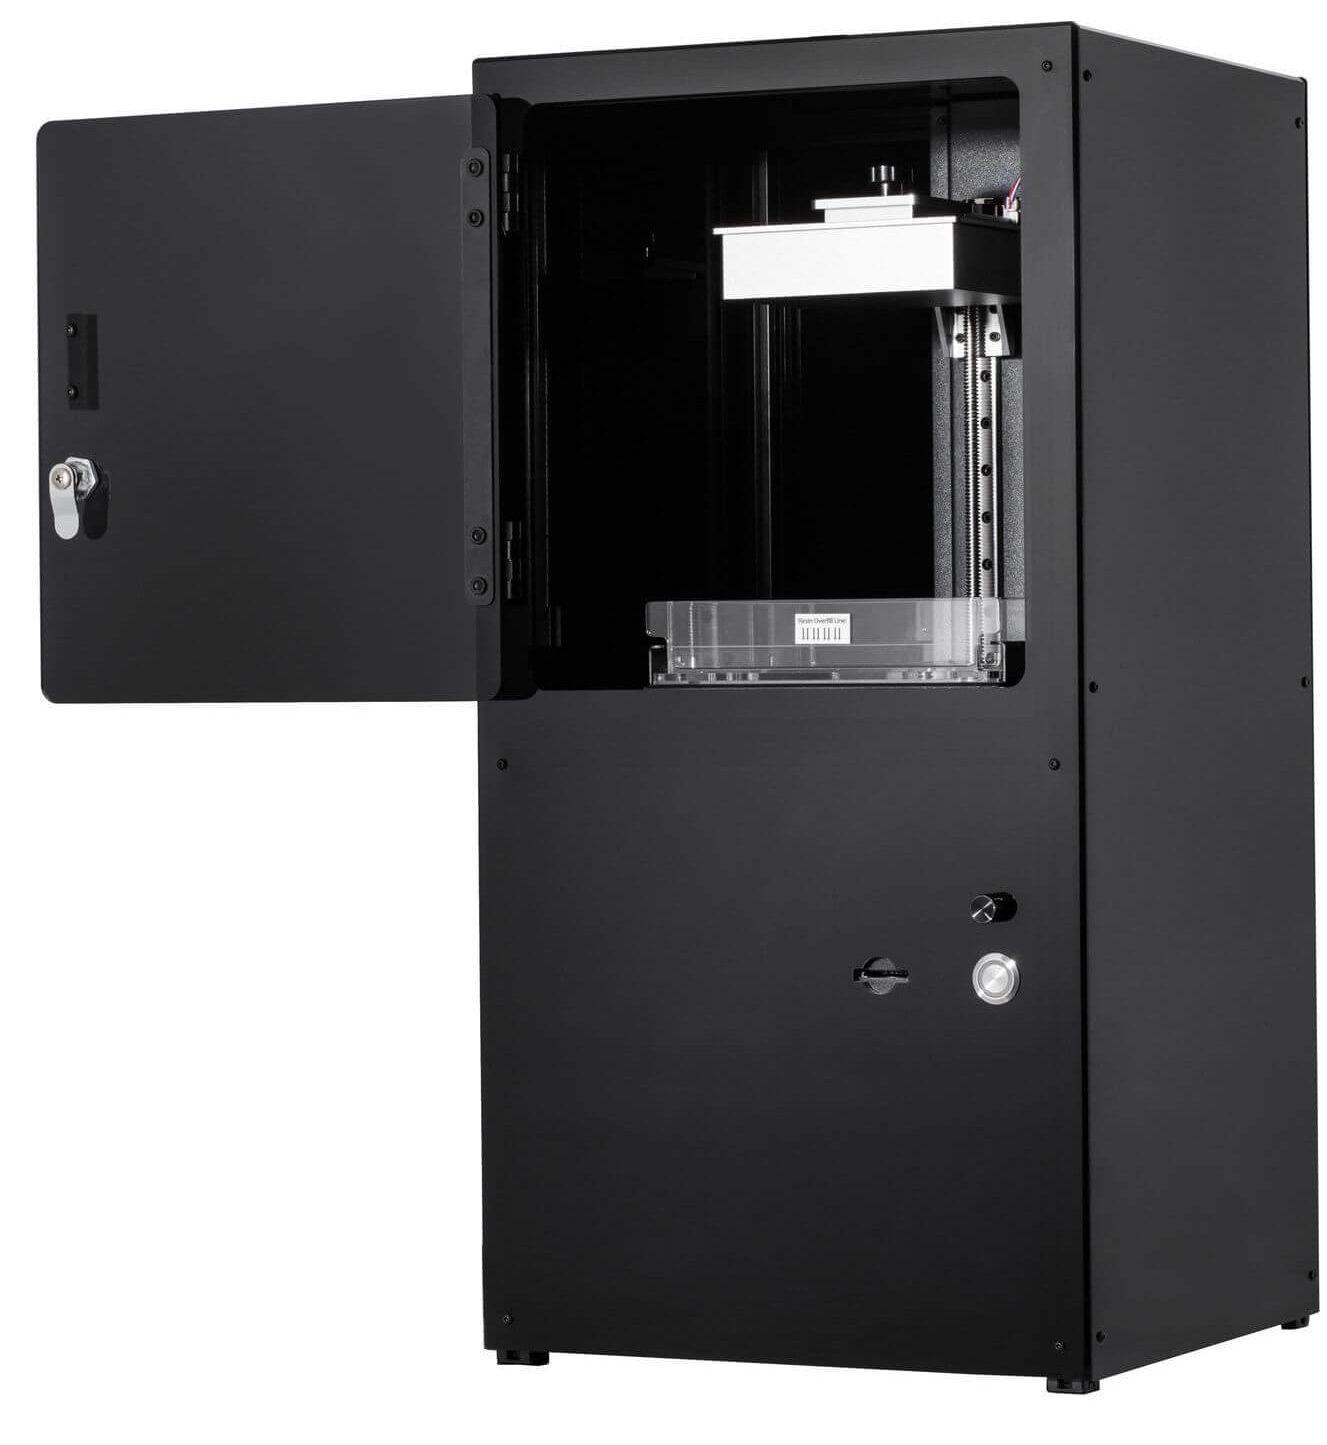 Peopoly Moai – SLA 3D Printer In-Depth Review 3 (1)